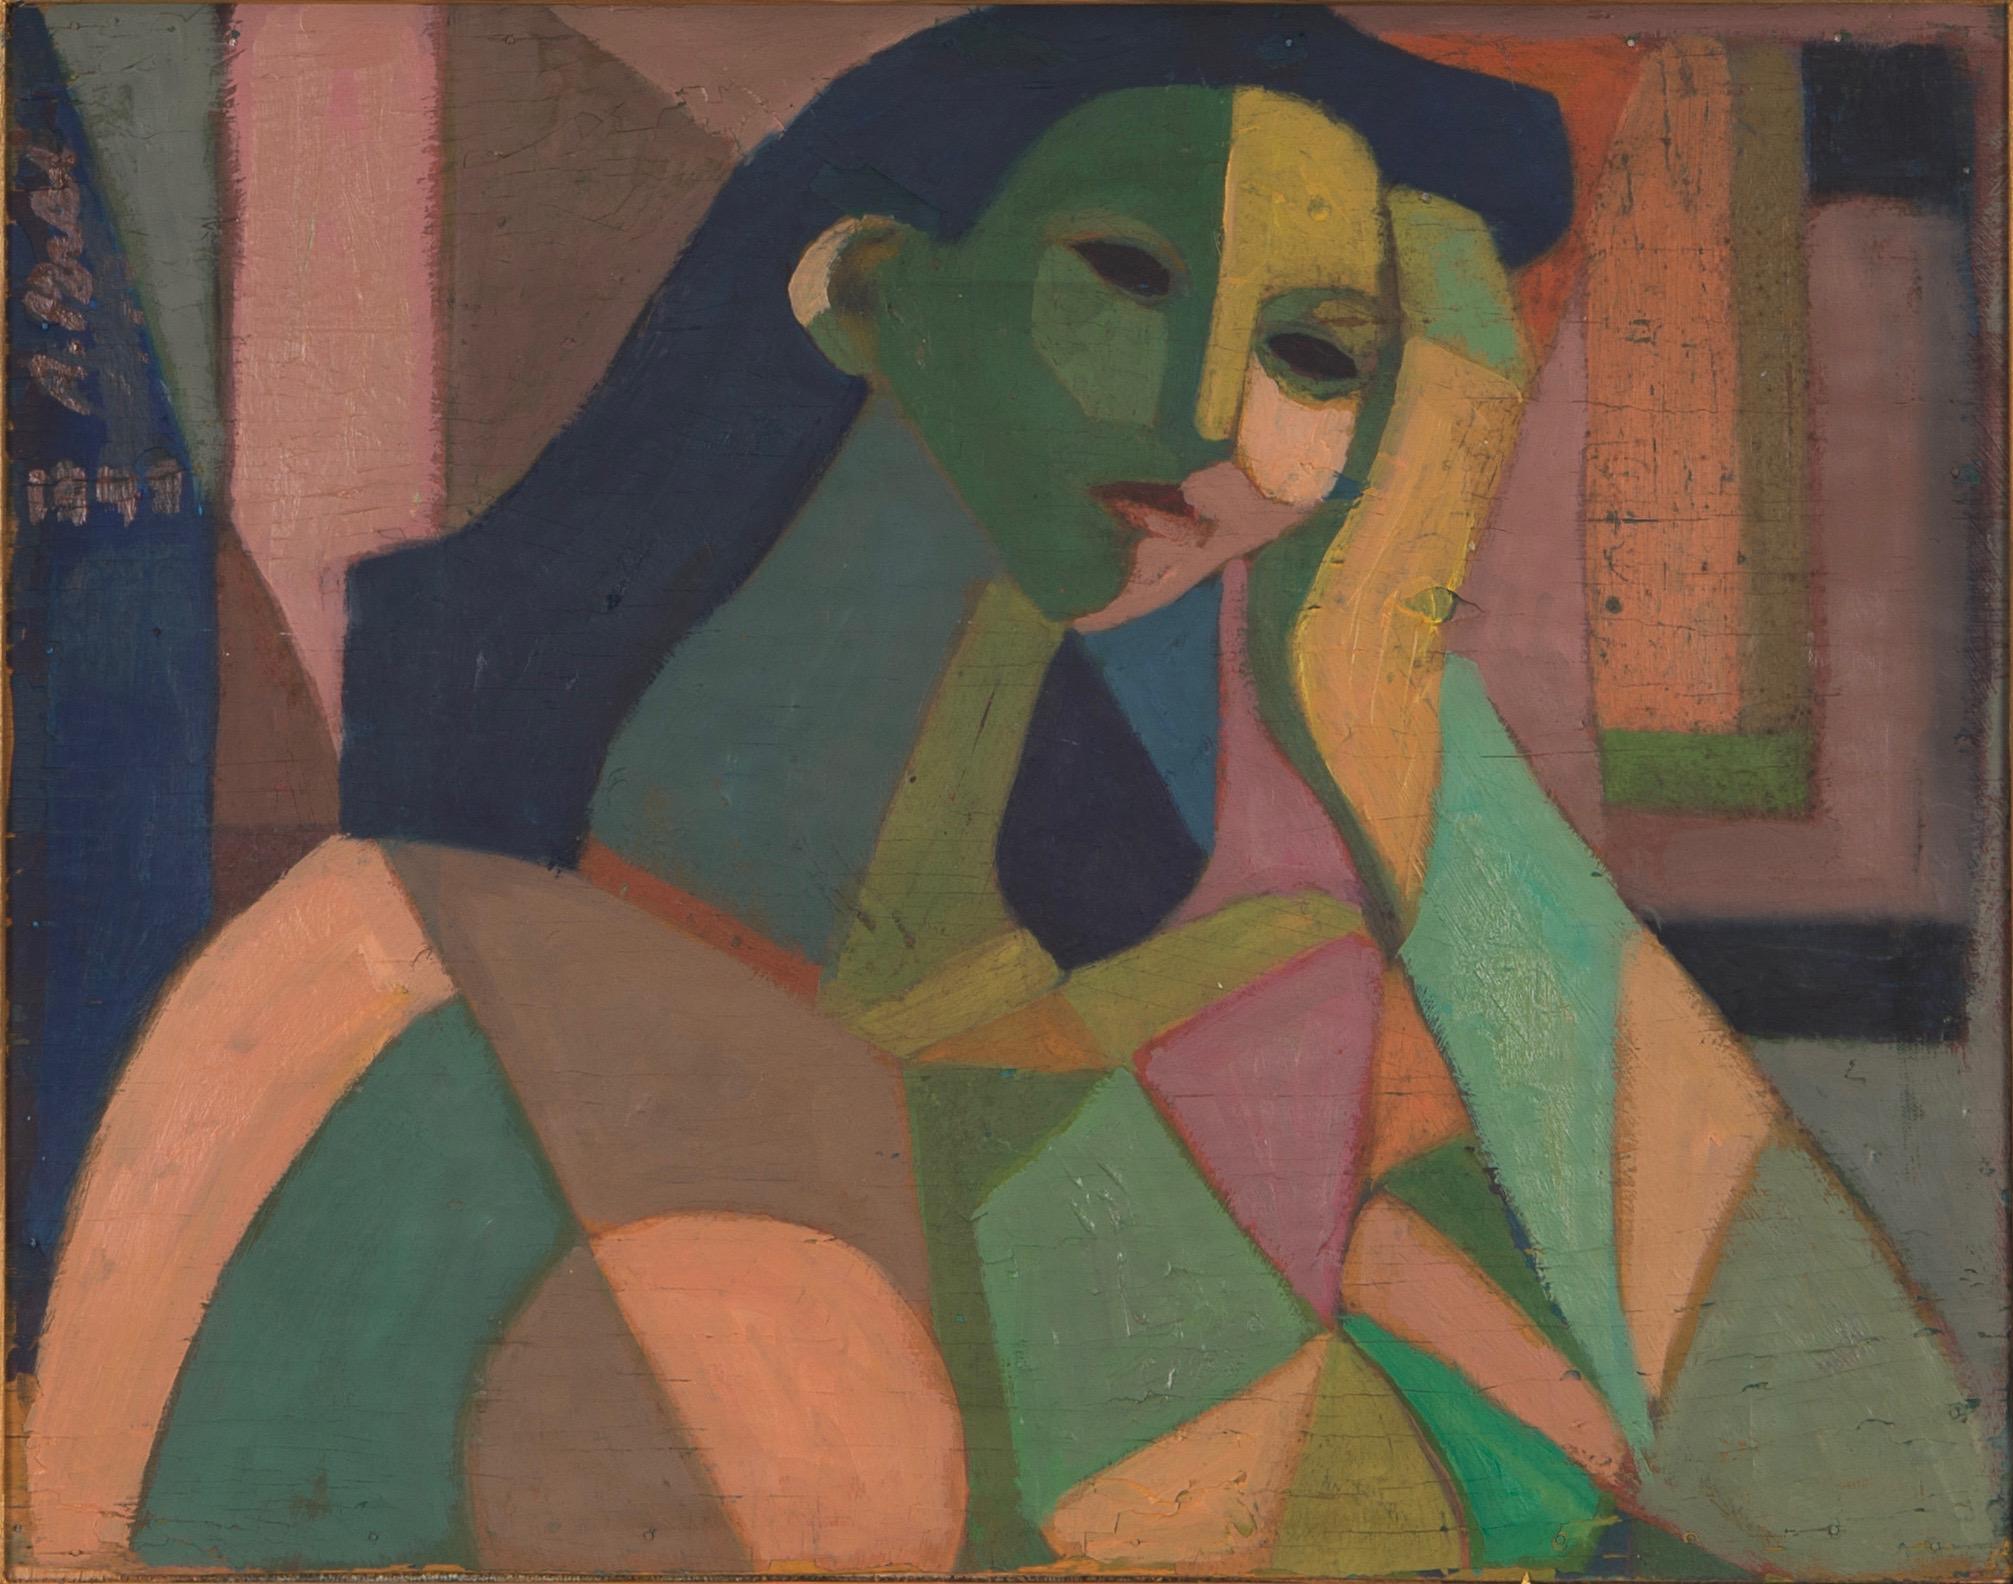 Ahmed-Morsi-Untitled-(Cubist-Bust)-Alexandria-1948.jpg